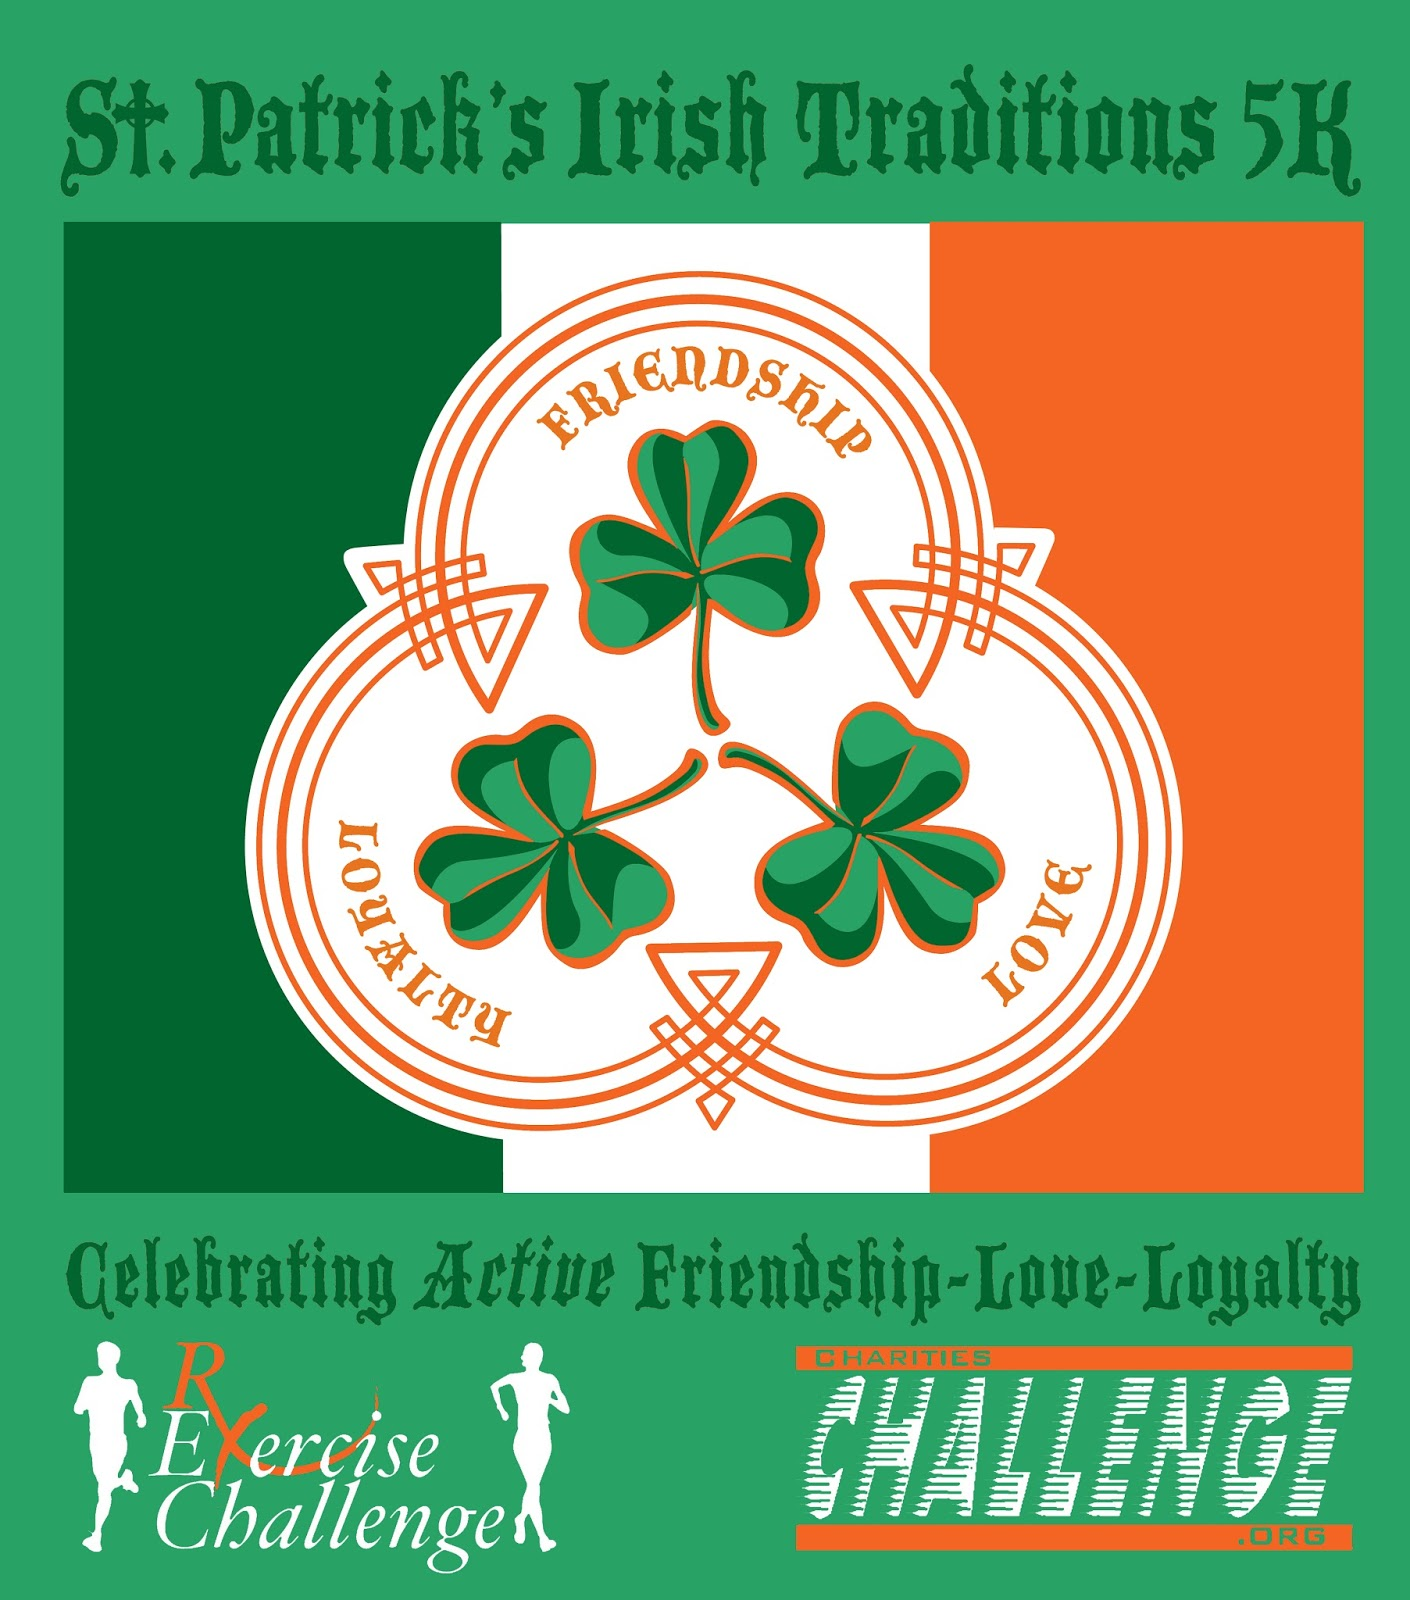 RxExerciseChallenge: St Patrick's Irish Traditions 5k ...